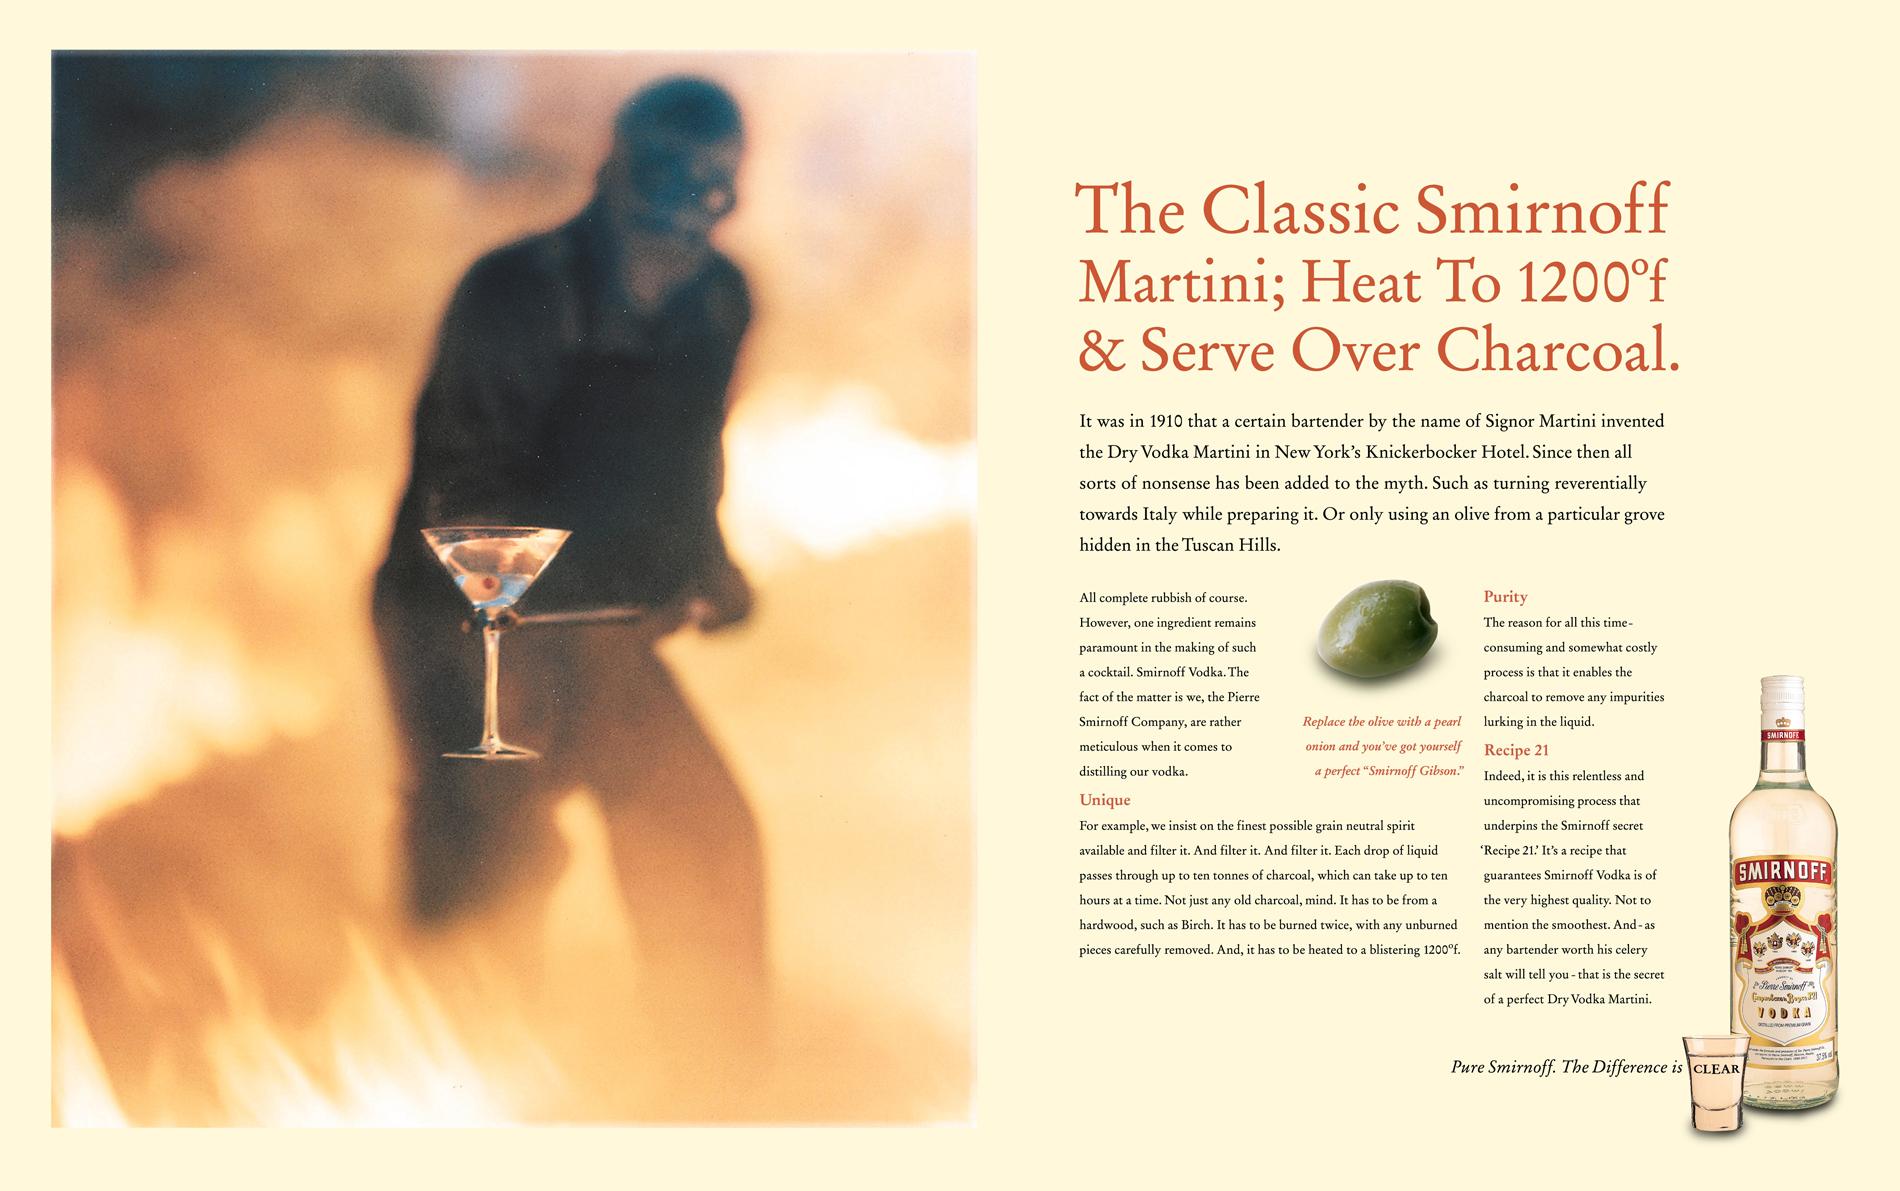 Smirnoff-Martini